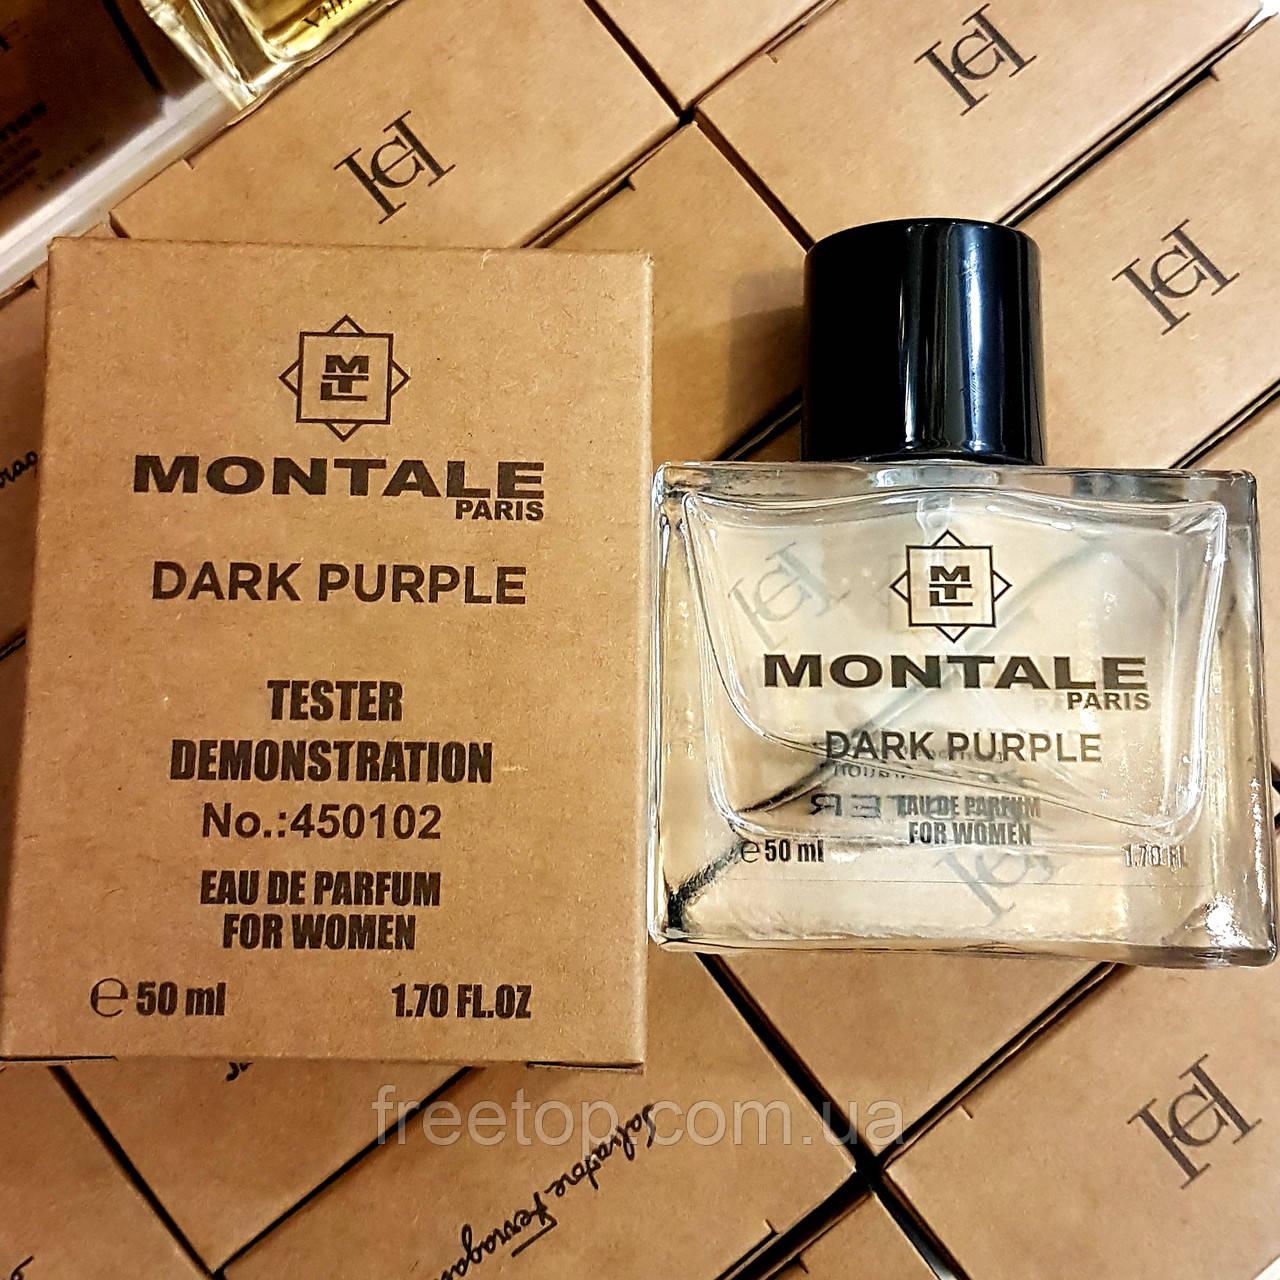 Тестер MONTALE Dark Purple жіночі (Монталь Дарк Перпл), 50 мл (ліцензія ОАЕ)